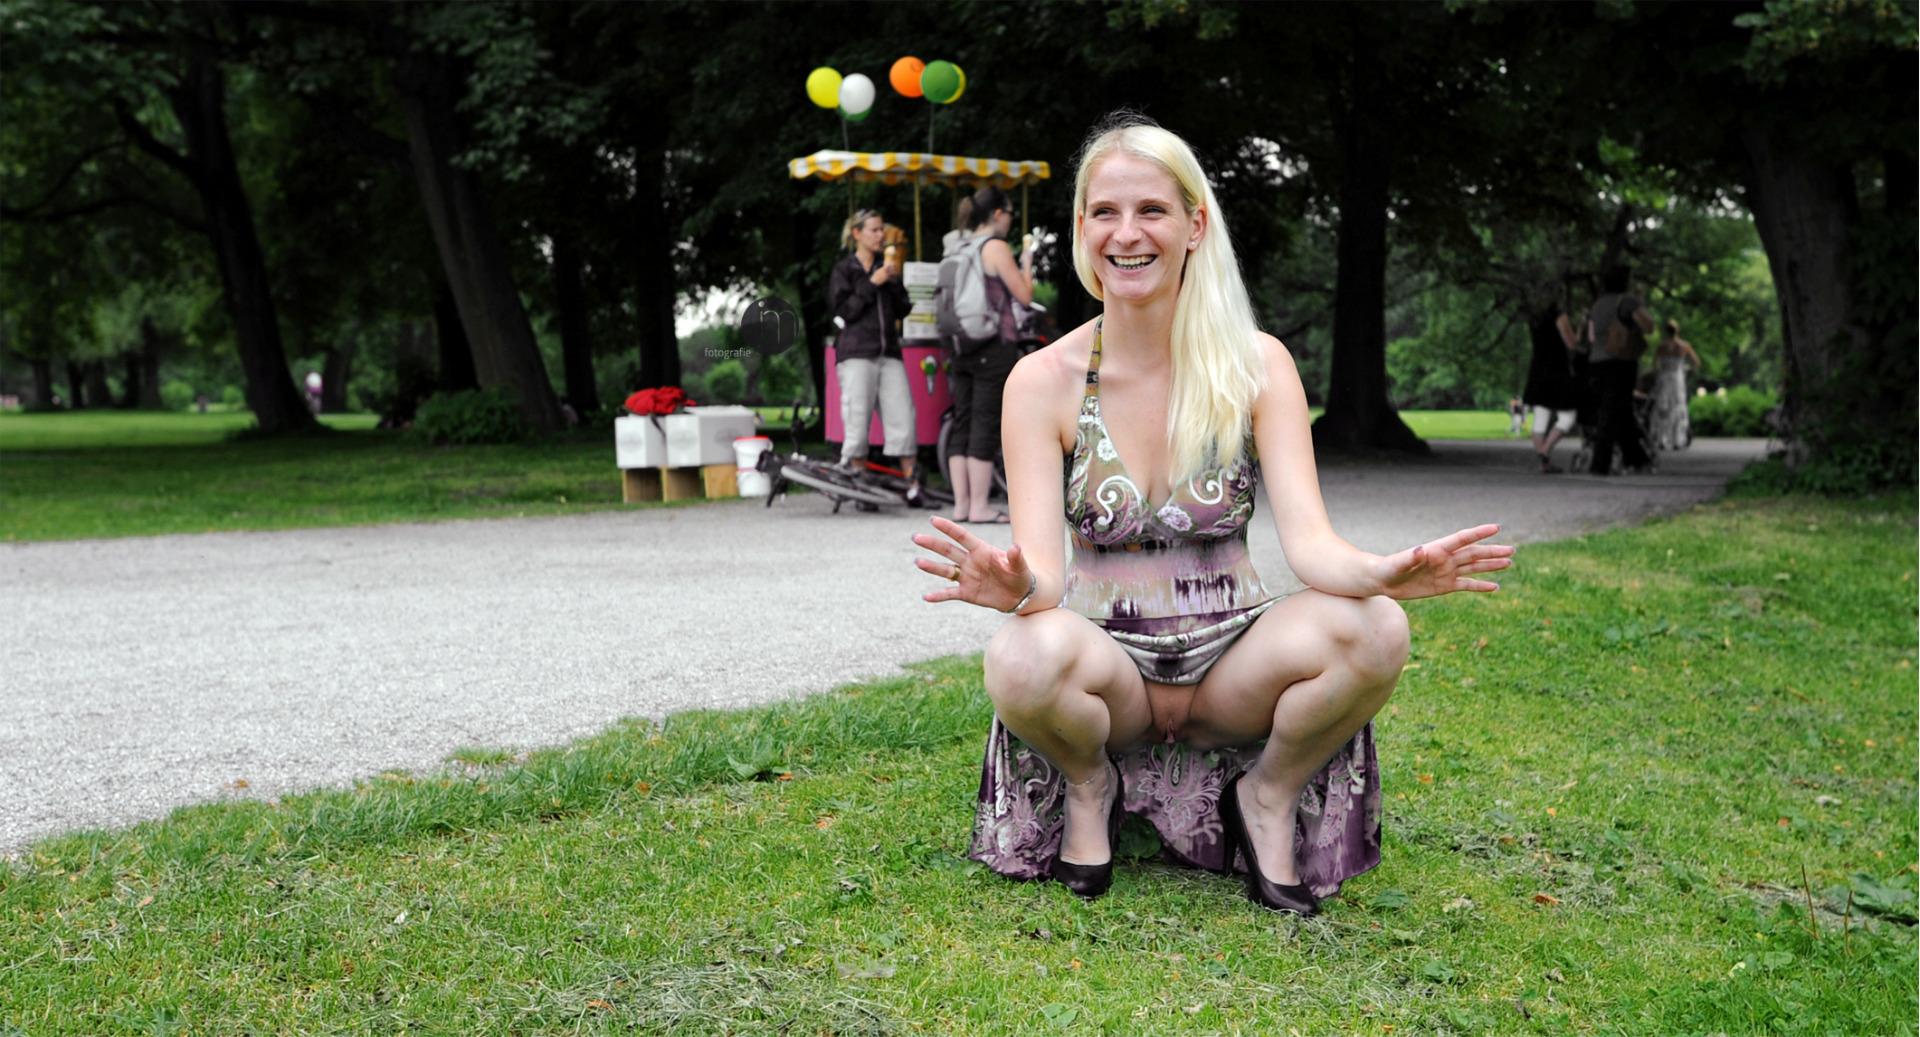 twice likey teaser chaeyoung sana dahyun #blonde #smile #public #outdoors #flashing #pussy #flashingpussy #park #dress